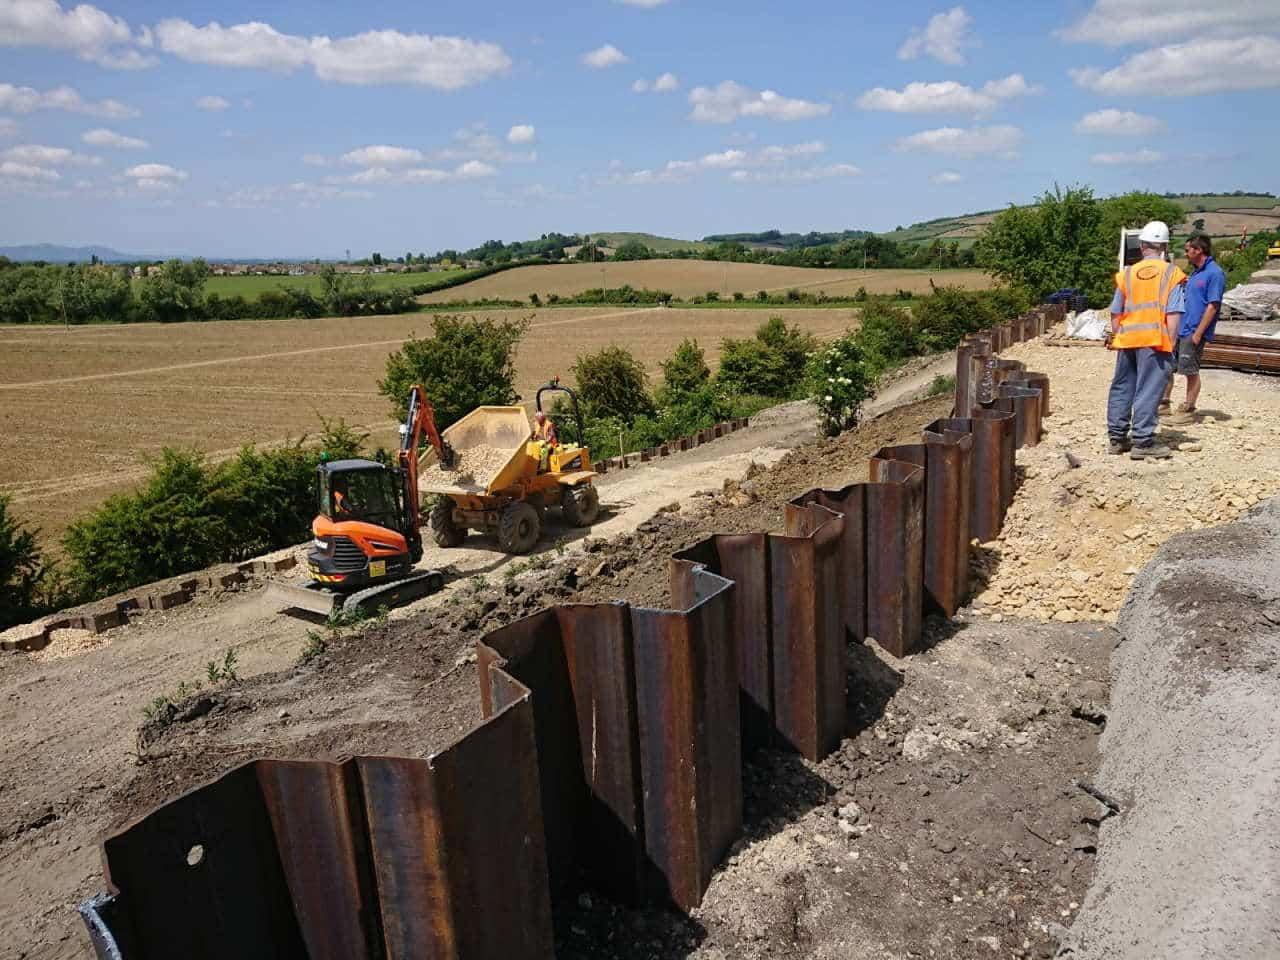 Gloucestershire Warwickshire Railway appeal for embankment landslip